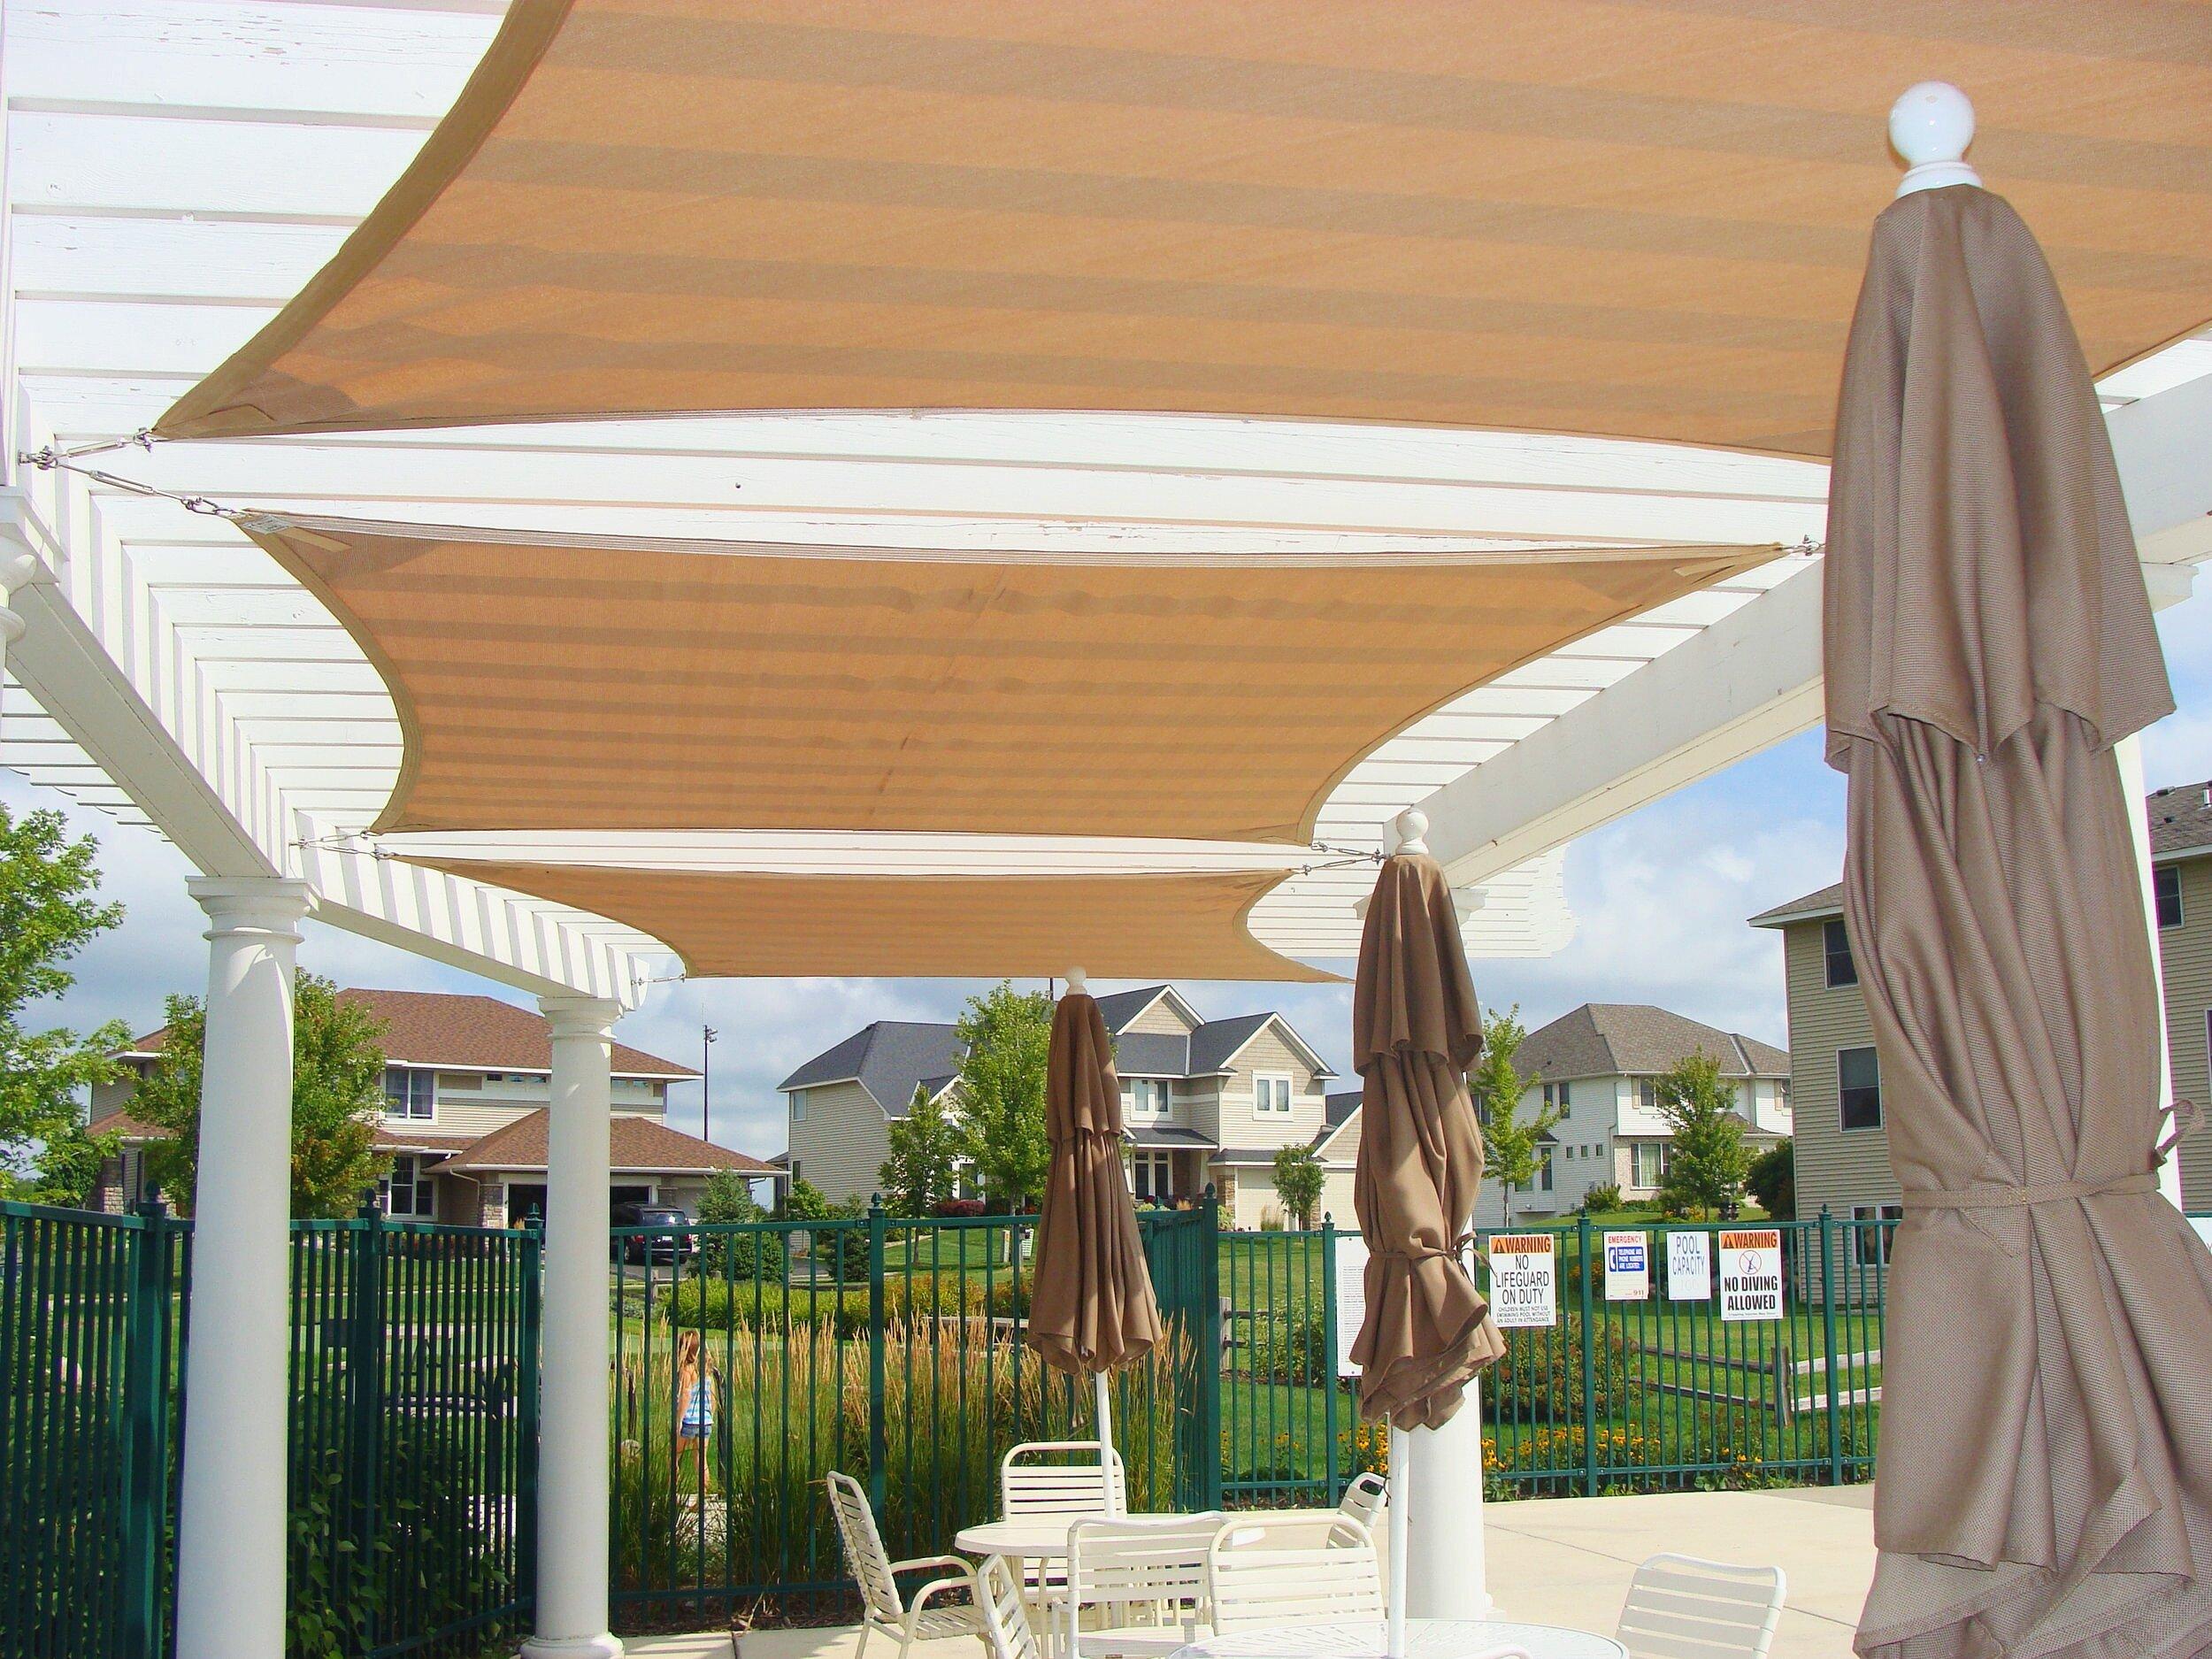 Awnings, Canopies, Shade Sail, Commercial Umbrella ... on Canvas Sun Shade Pergola id=46052